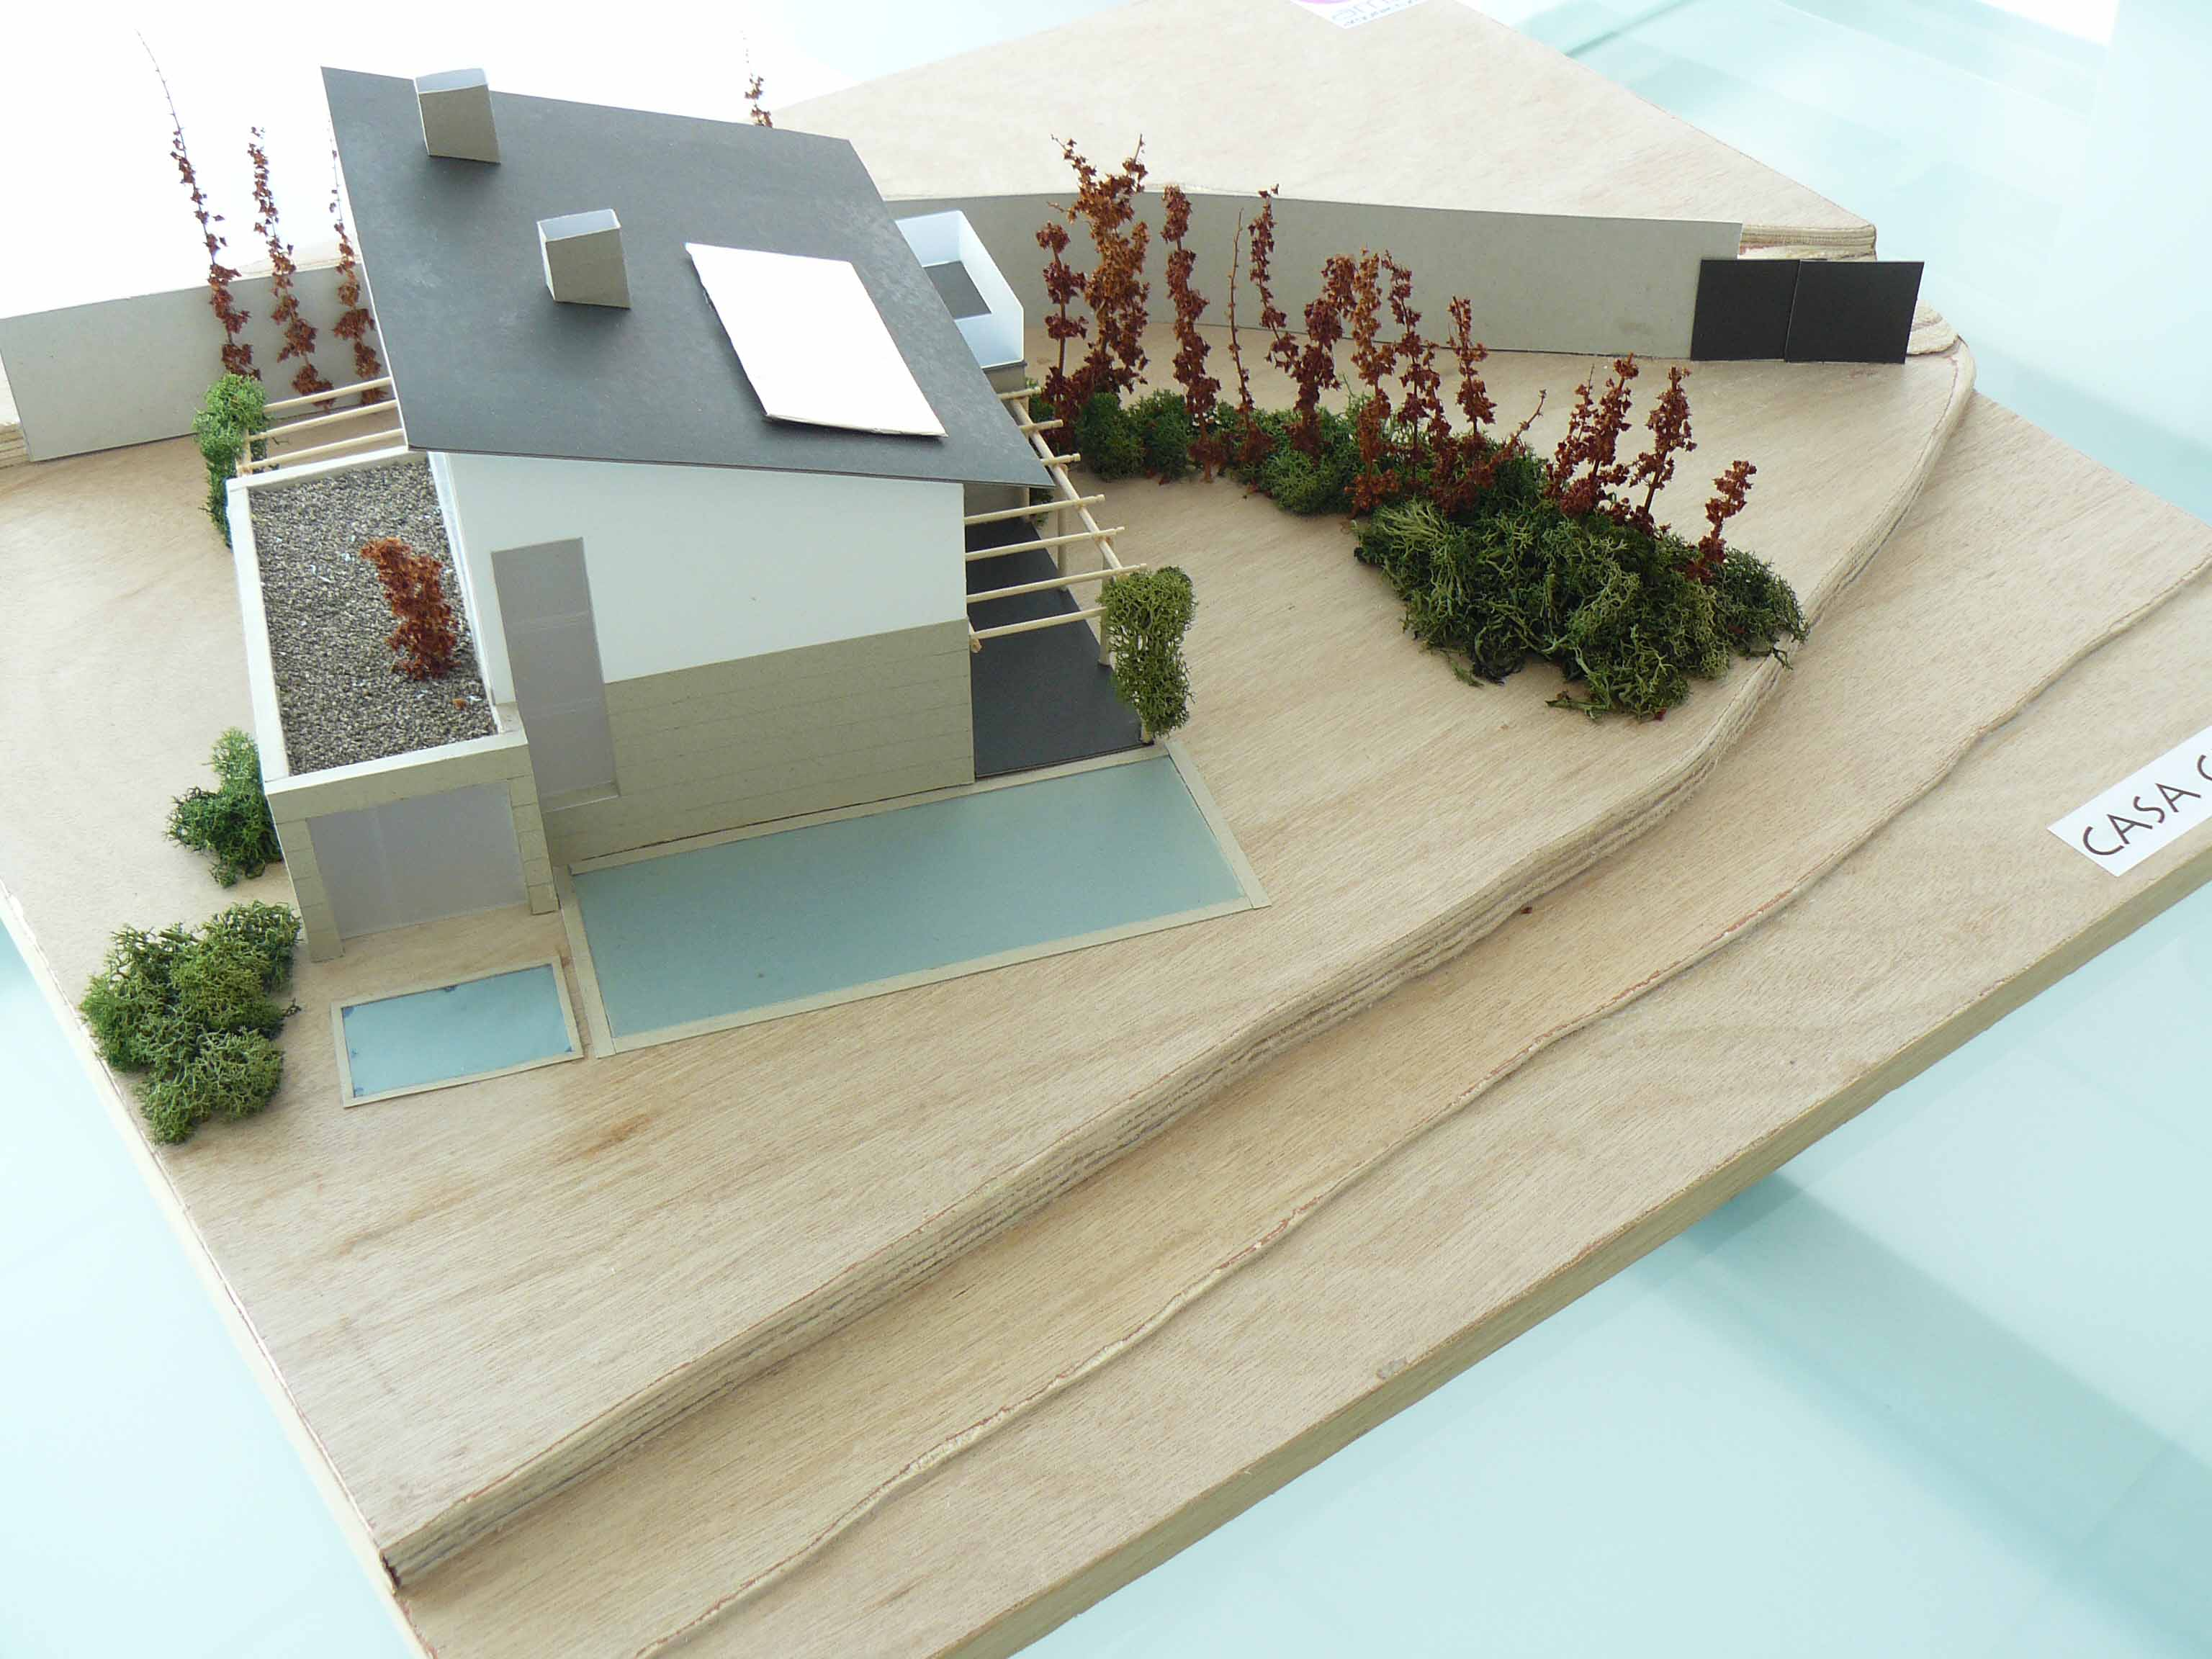 Casa Sostenible en Catoira1